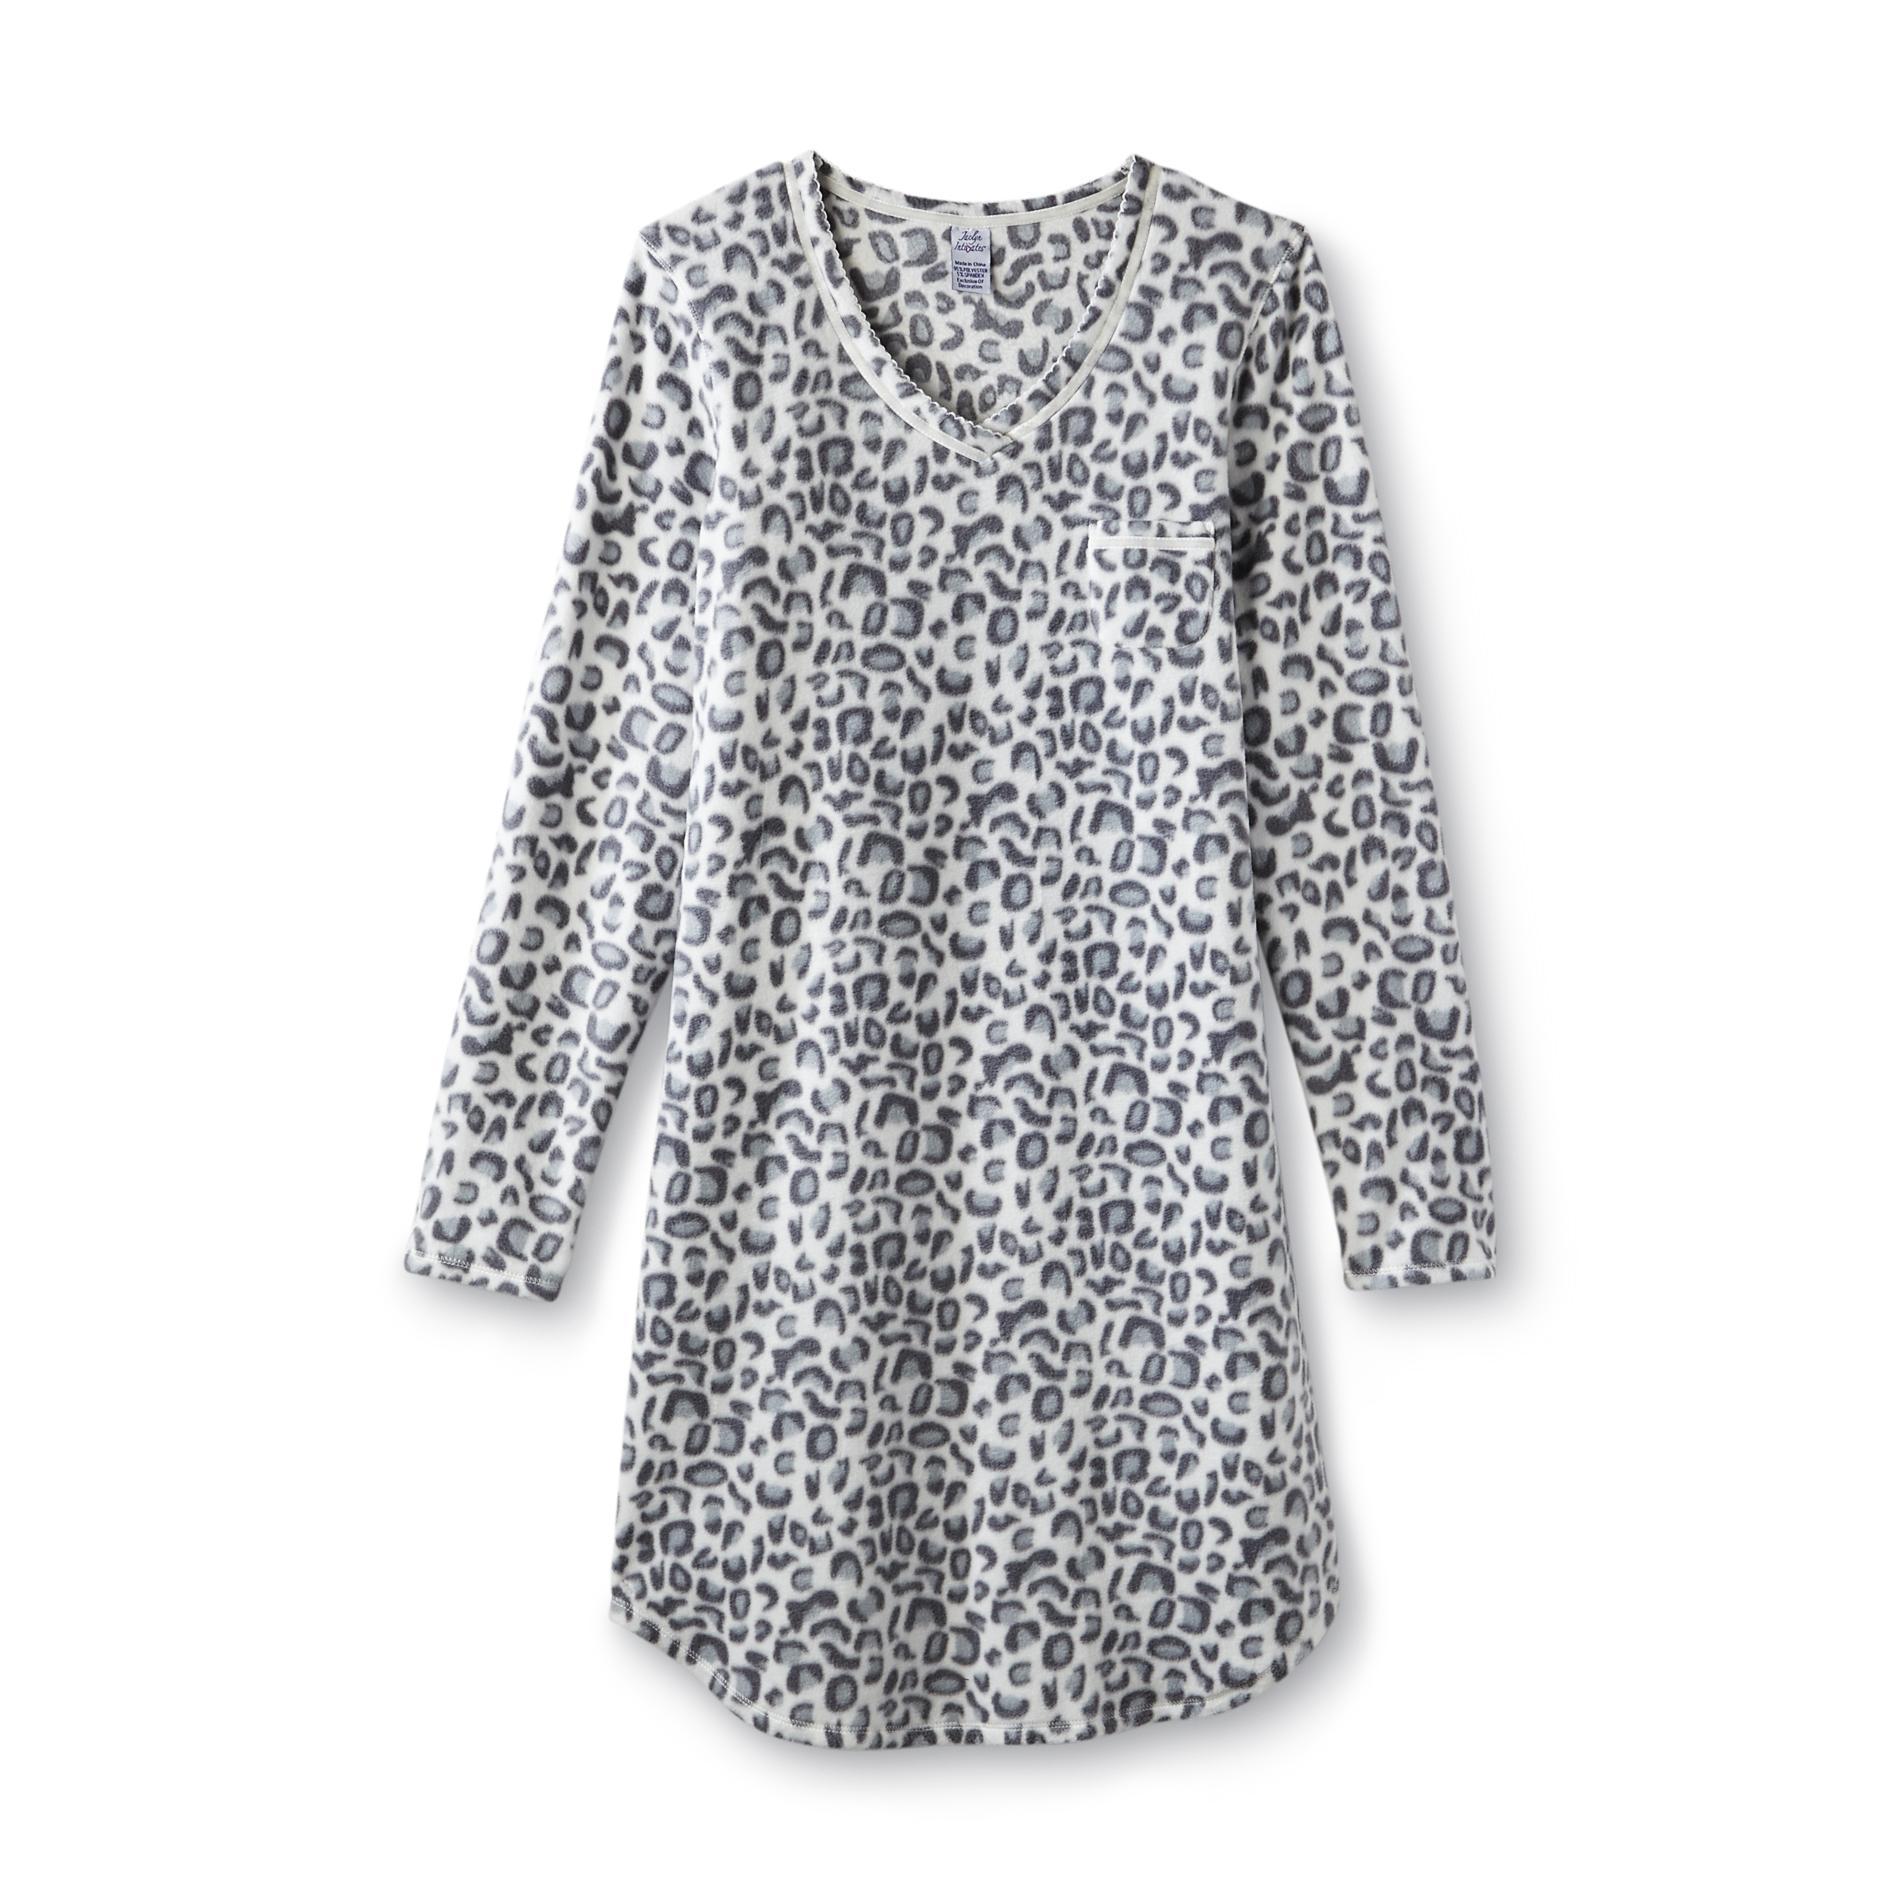 Jaclyn Intimates Women' Microfleece Nightshirt - Cheetah Print